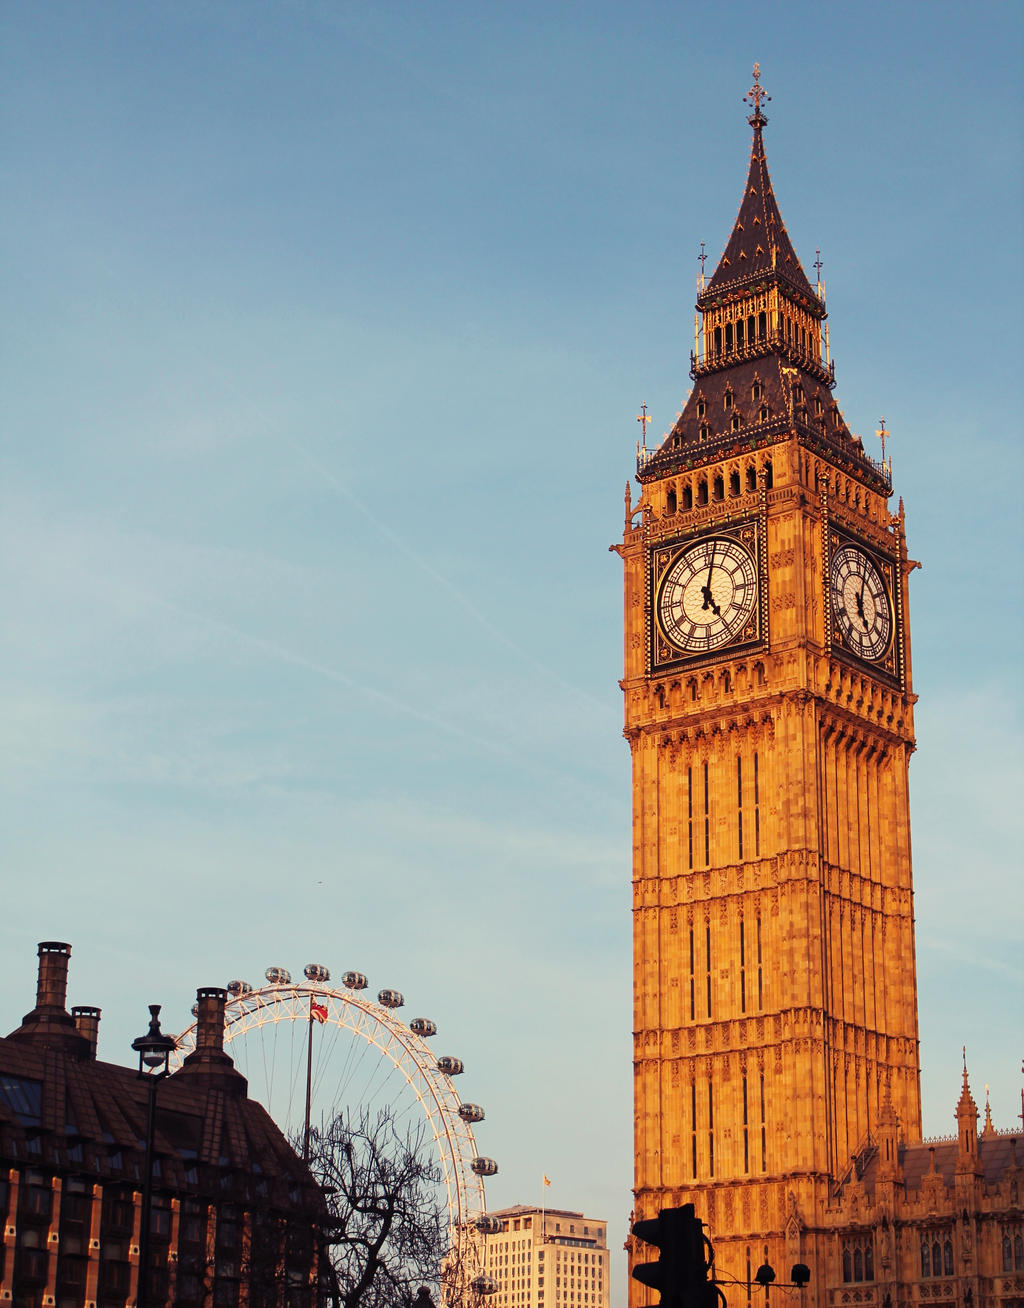 Big Ben by mandarinchenx